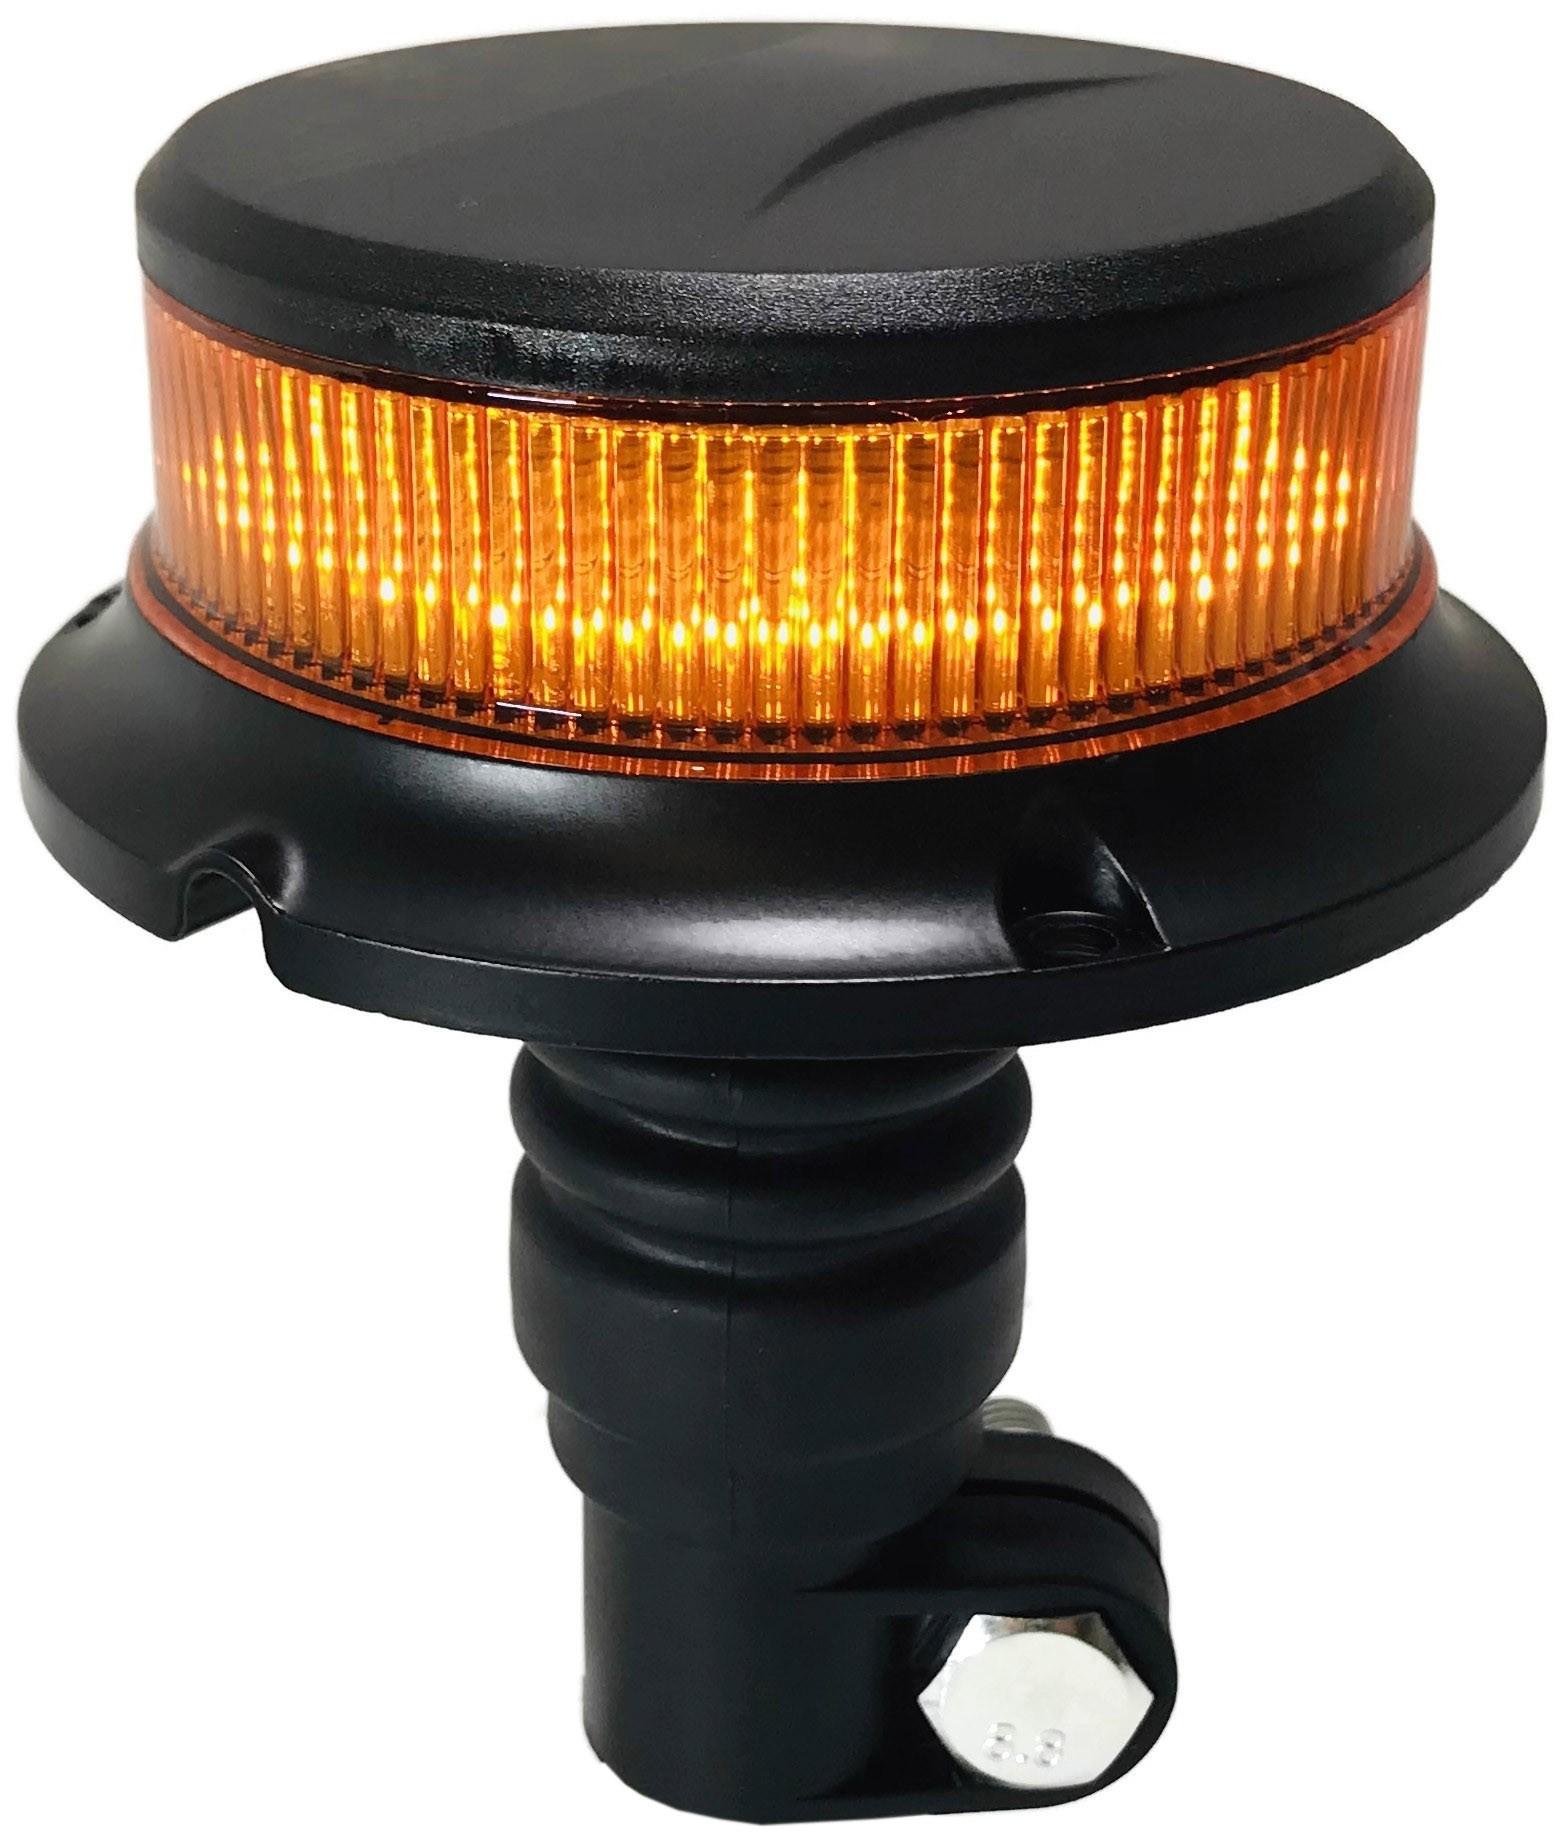 KOGUT LED PICO LAMPA OSTRZEGAWCZA TRZPIEŃ 12V 24V